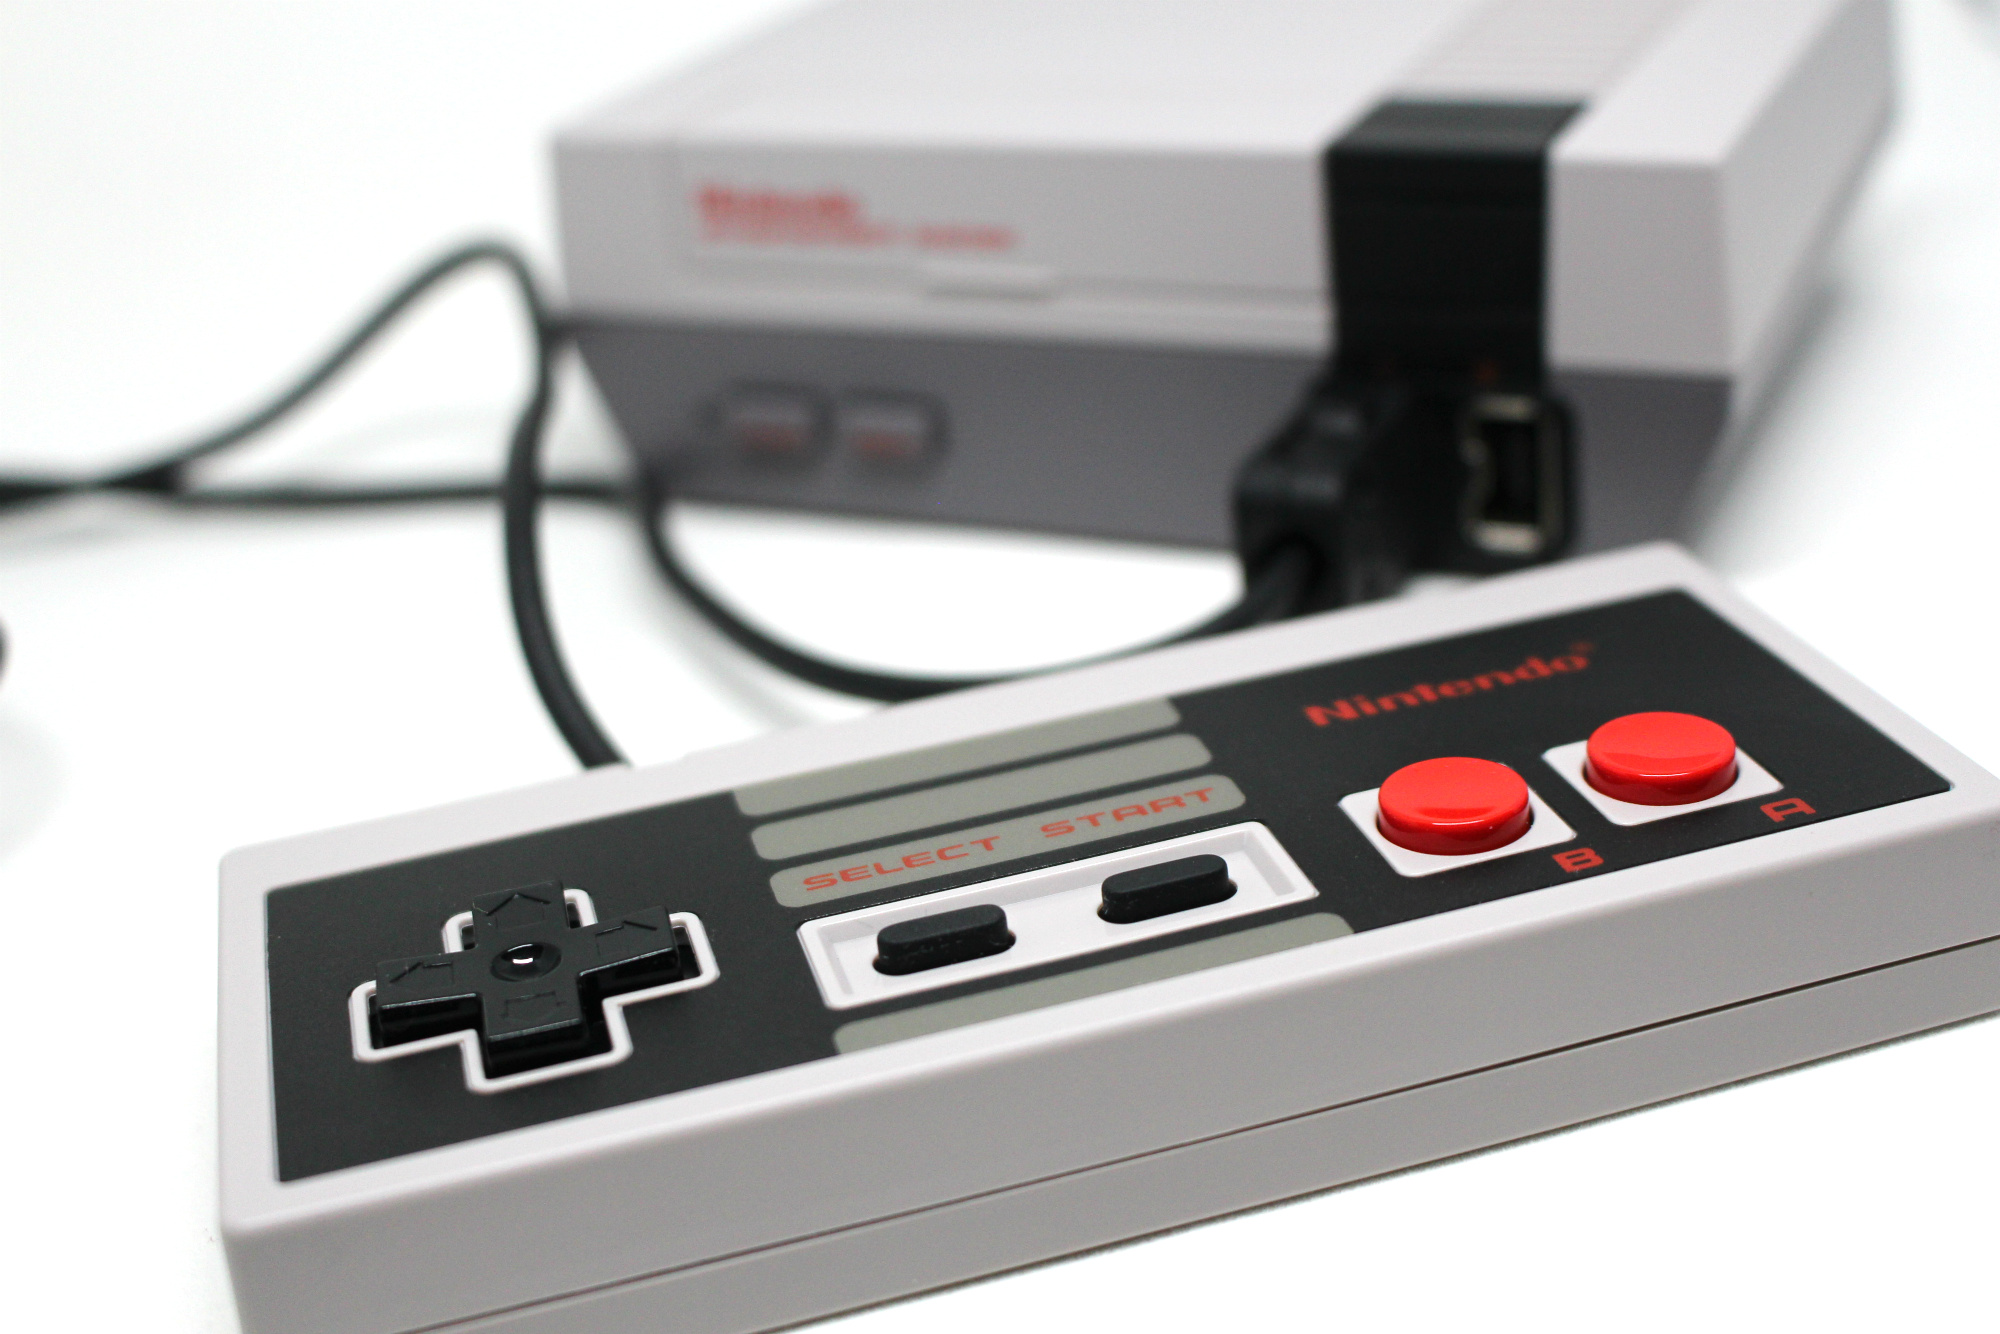 Hardware Review: NES Classic Mini: Nintendo Entertainment System